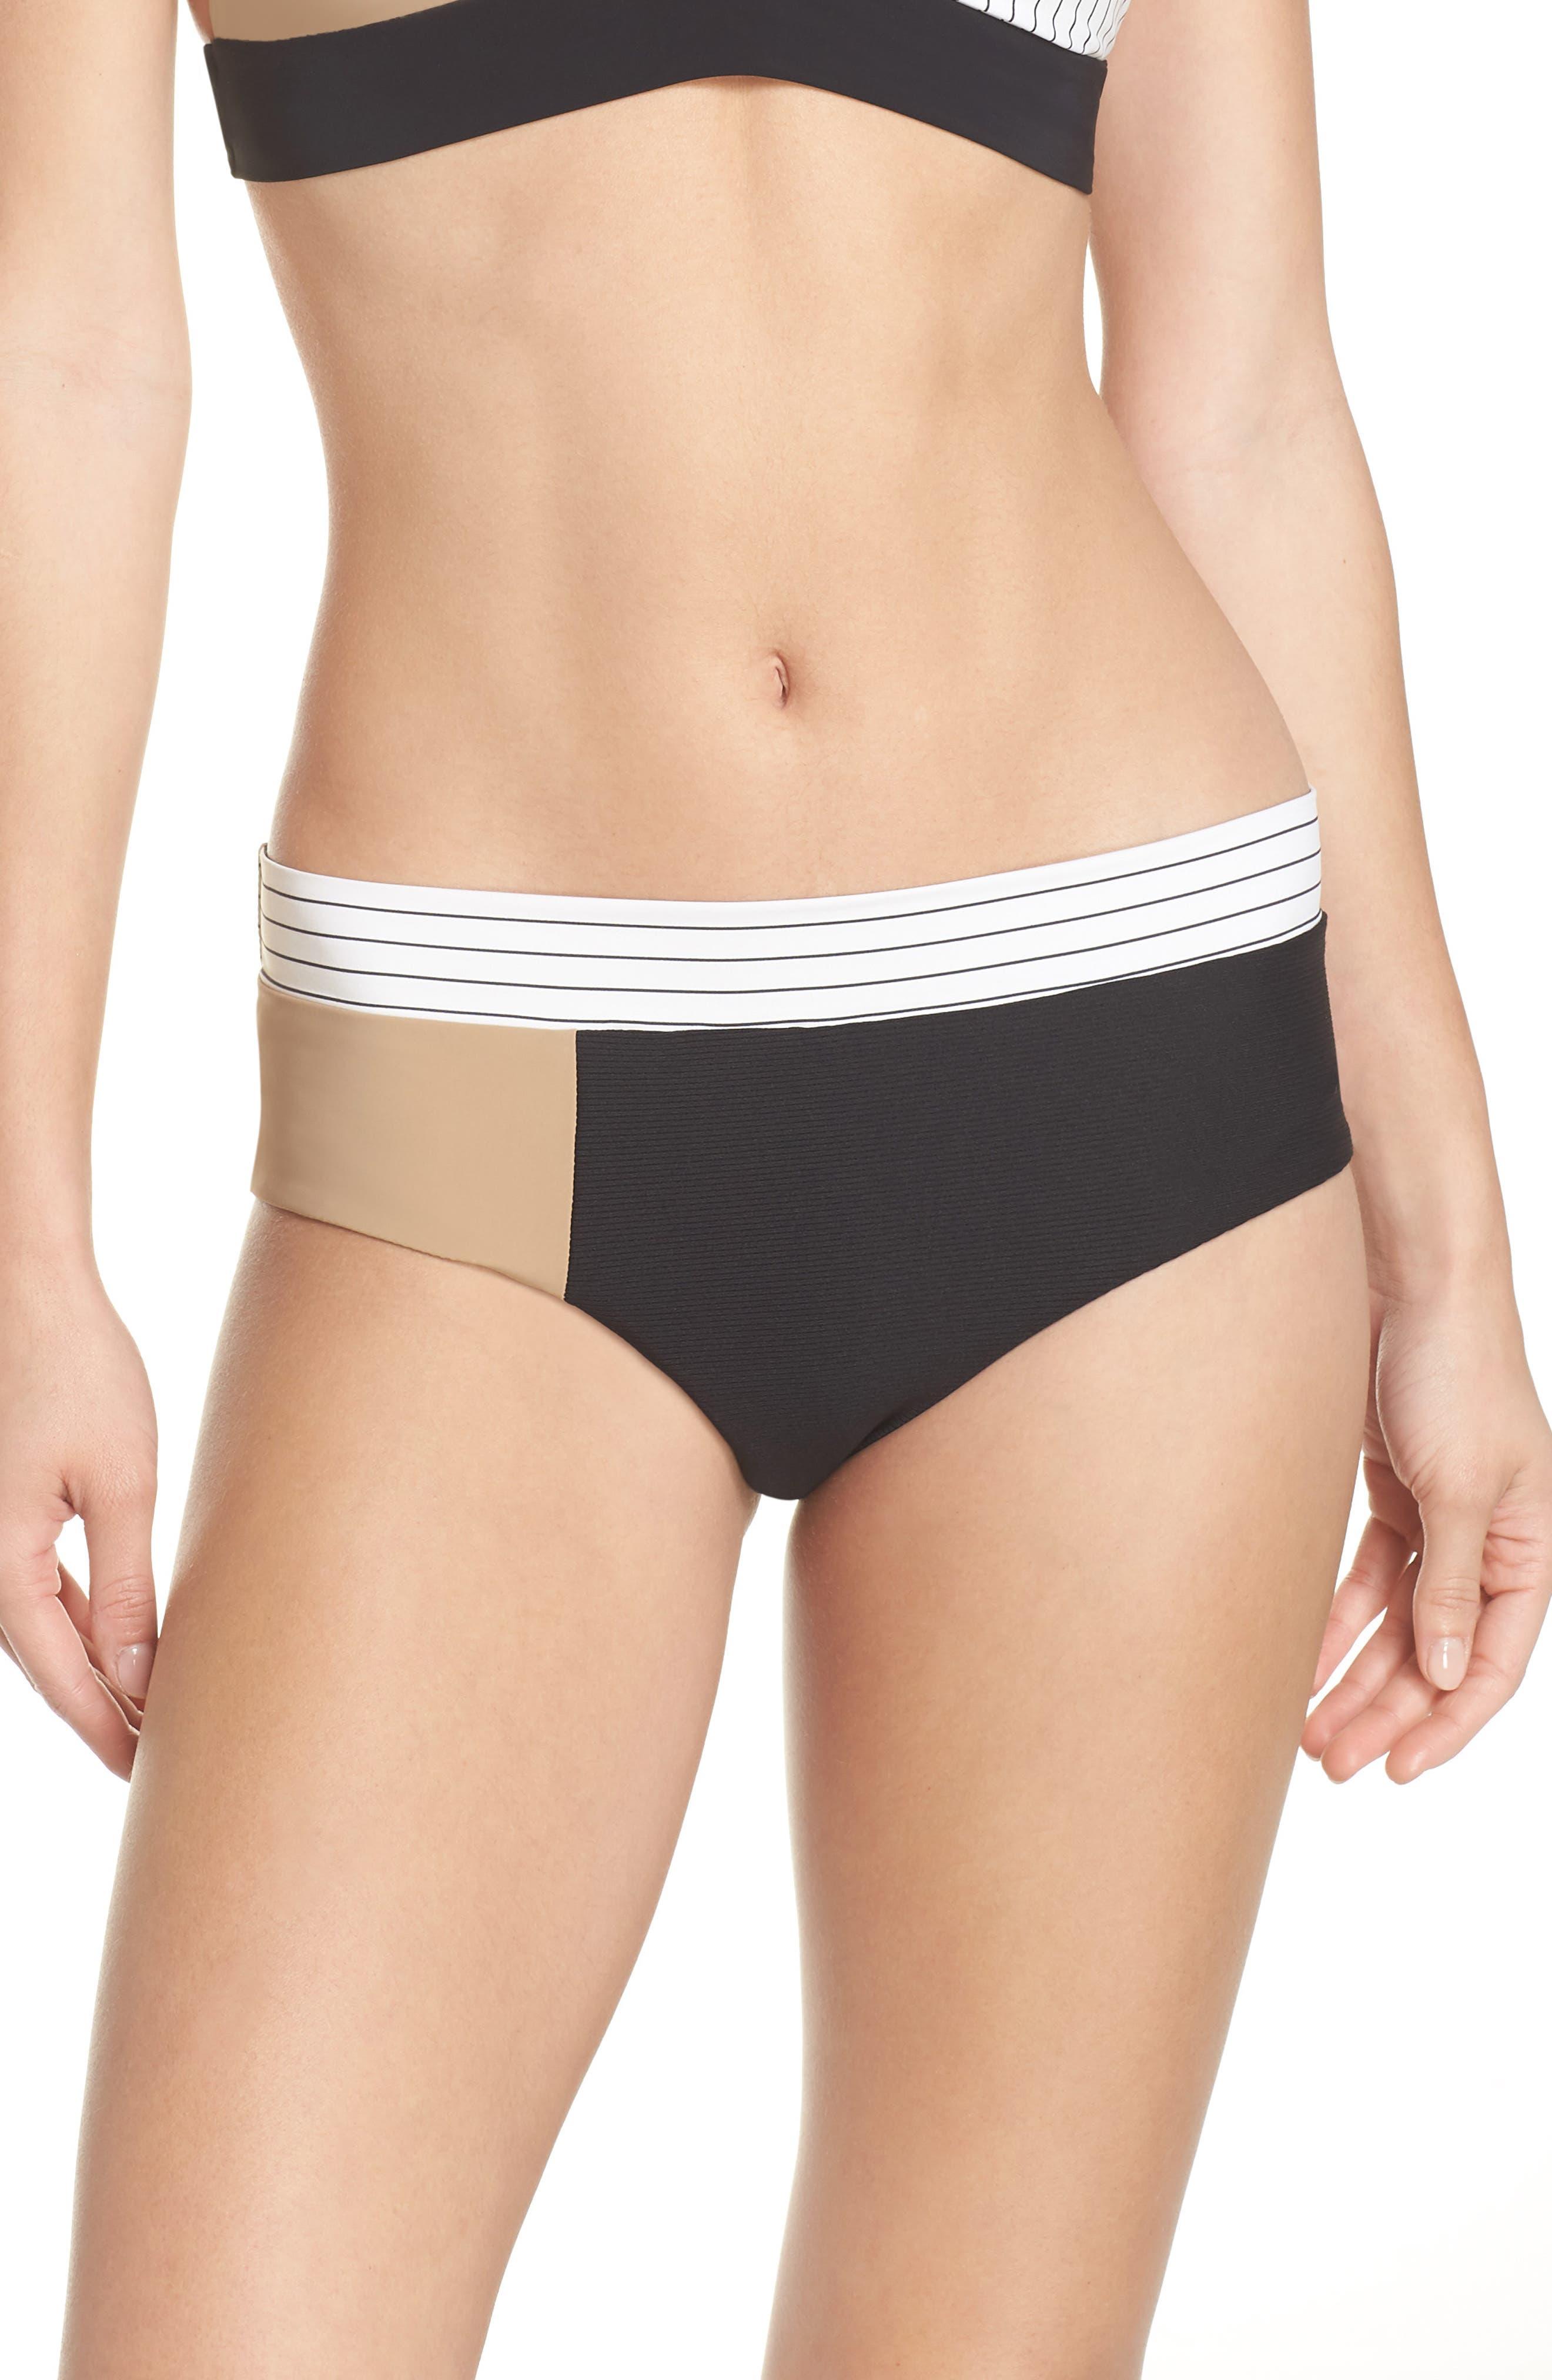 Makaveli Bikini Bottoms,                         Main,                         color, 250